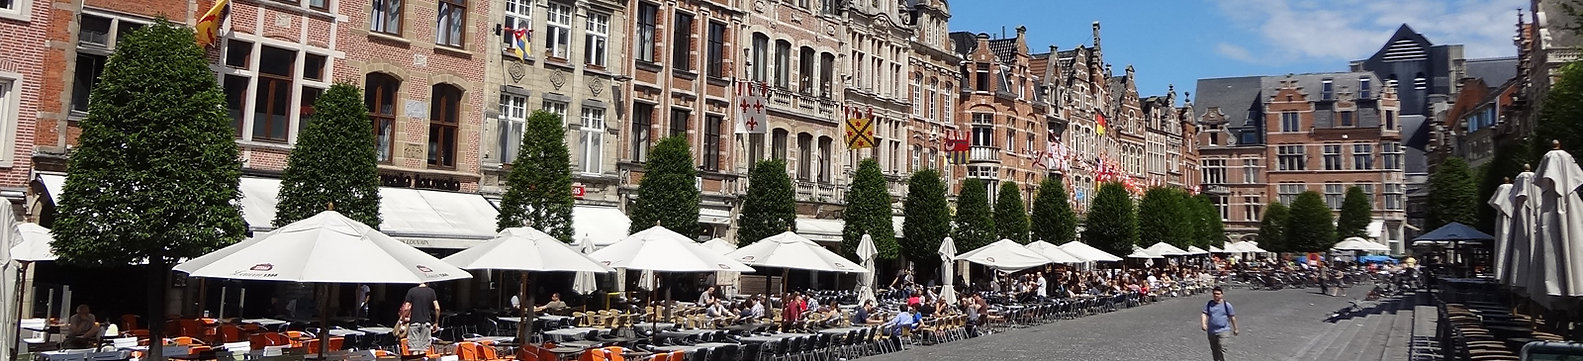 Leuven Web header image2.jpg